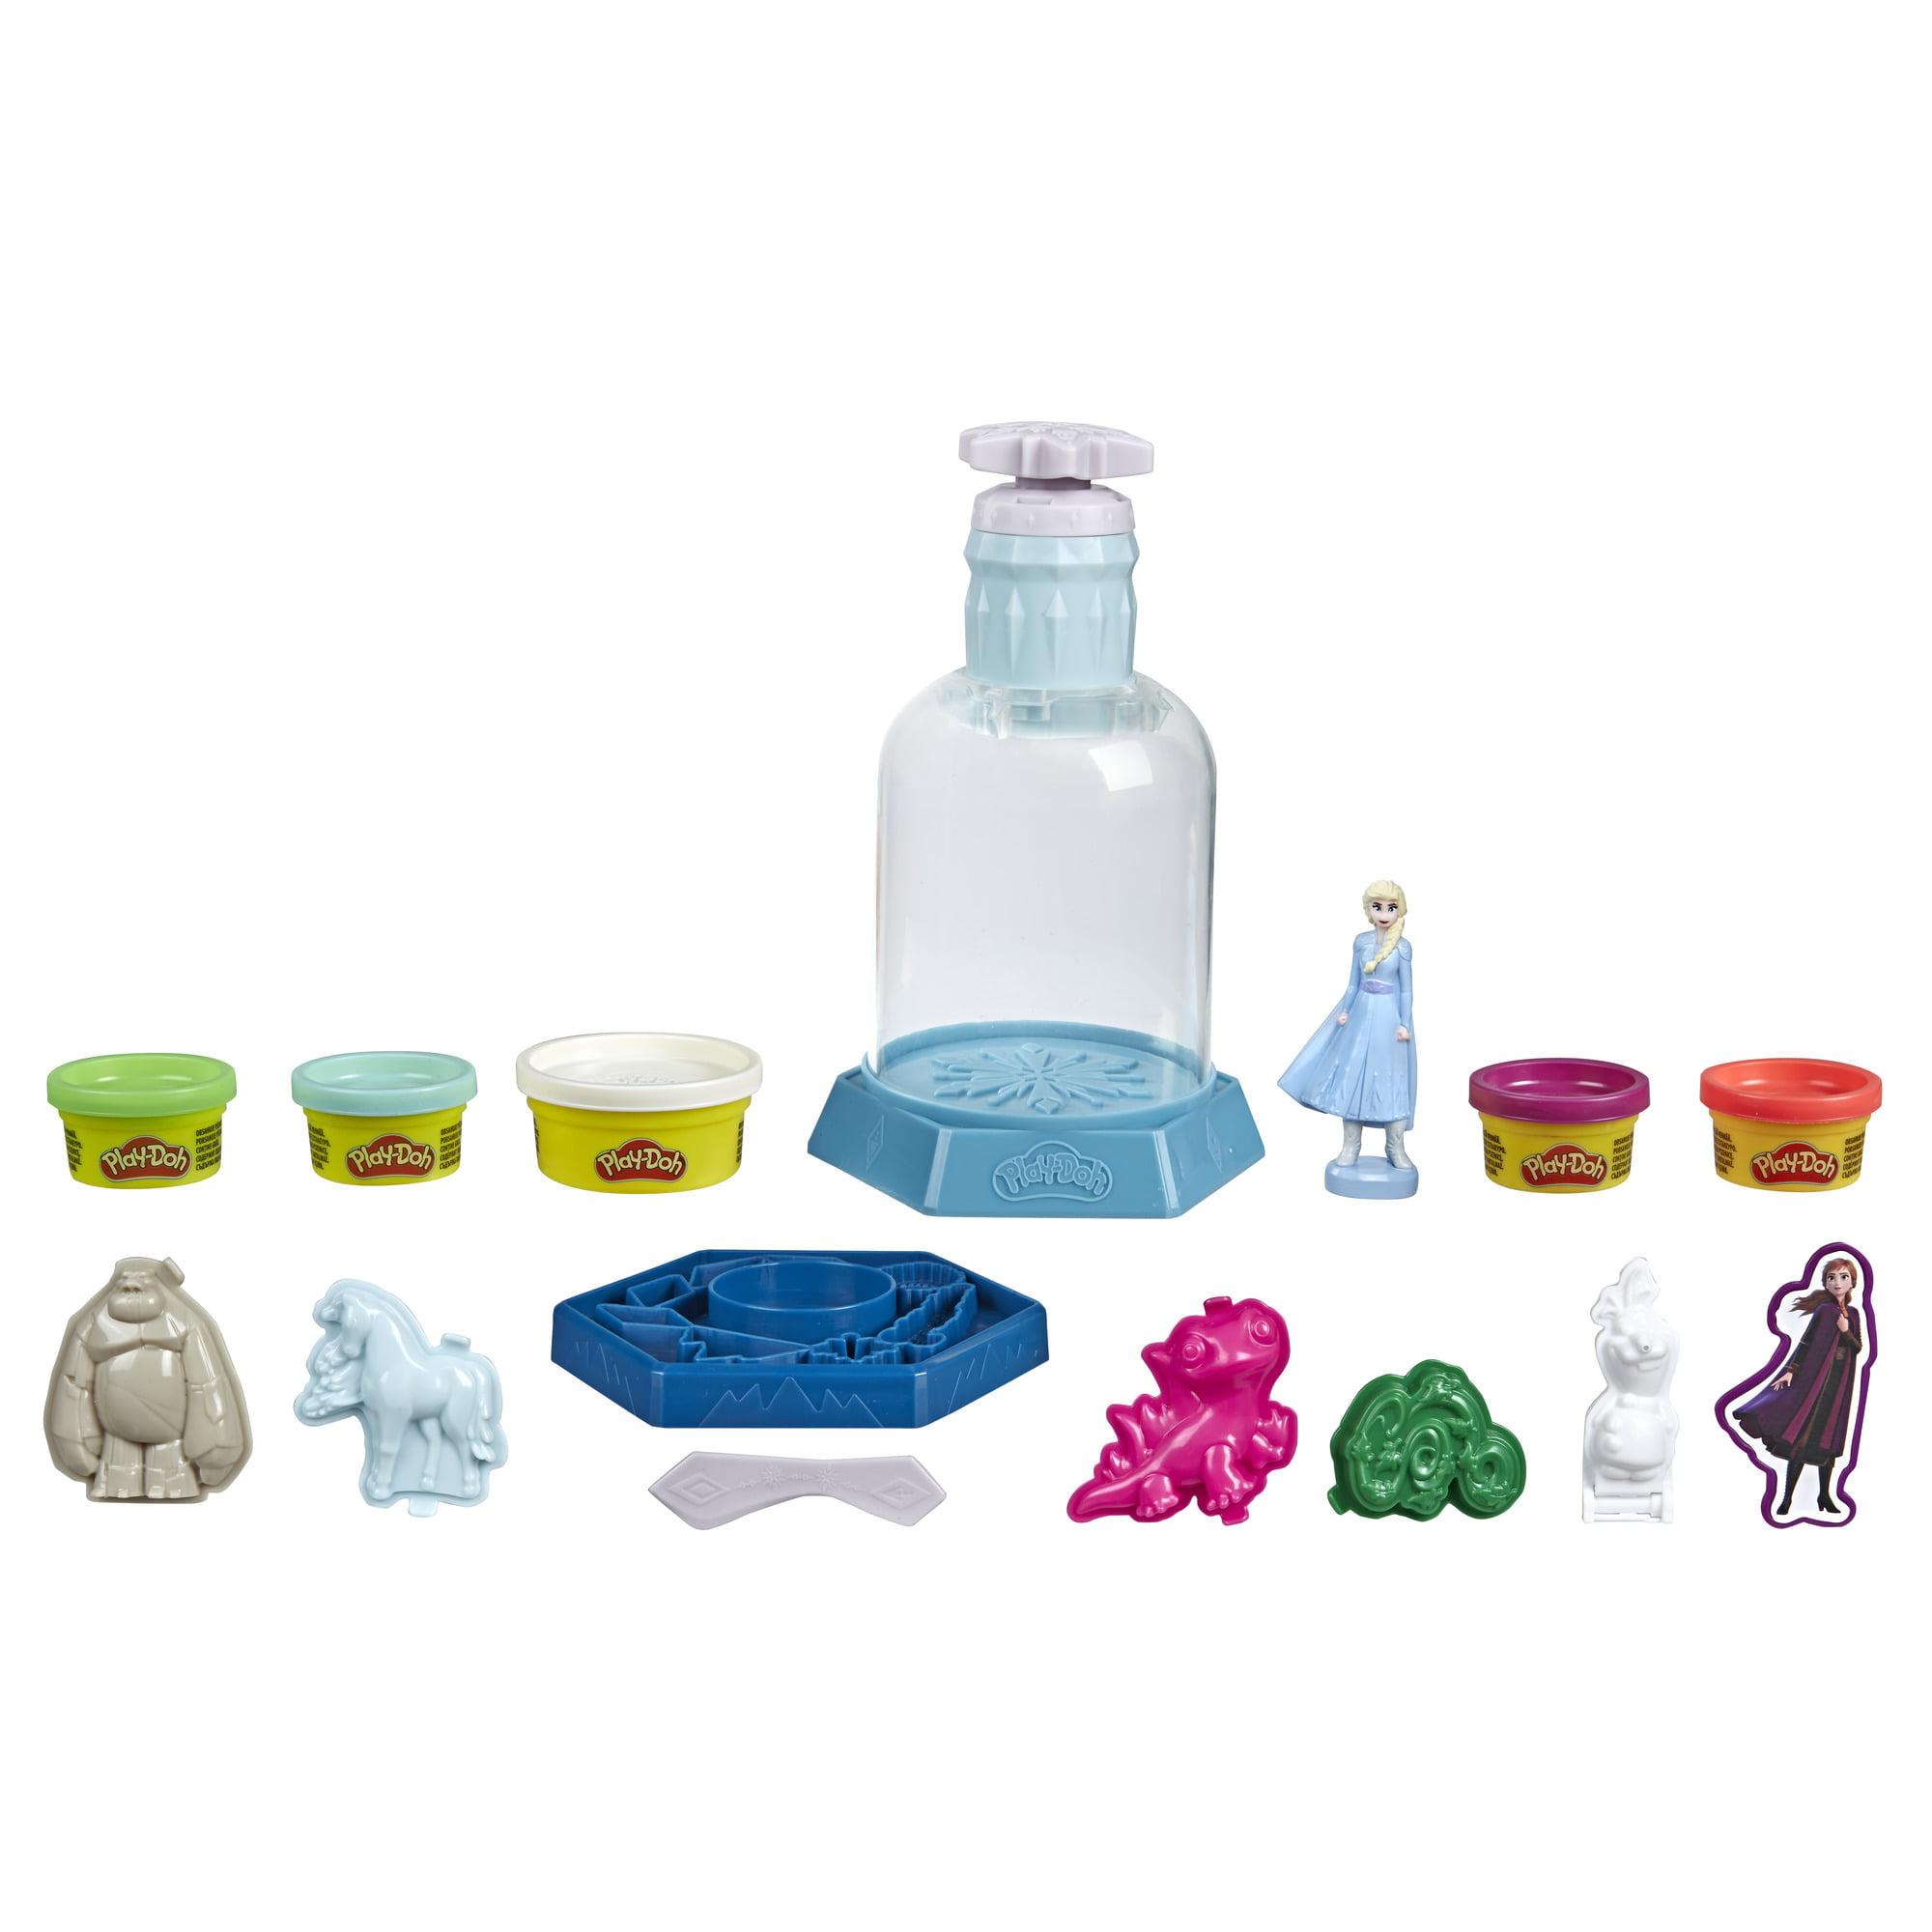 Kids Unicorn Play Dough Set Magic Accessories Shapes Creative Toy Xmas Gift New